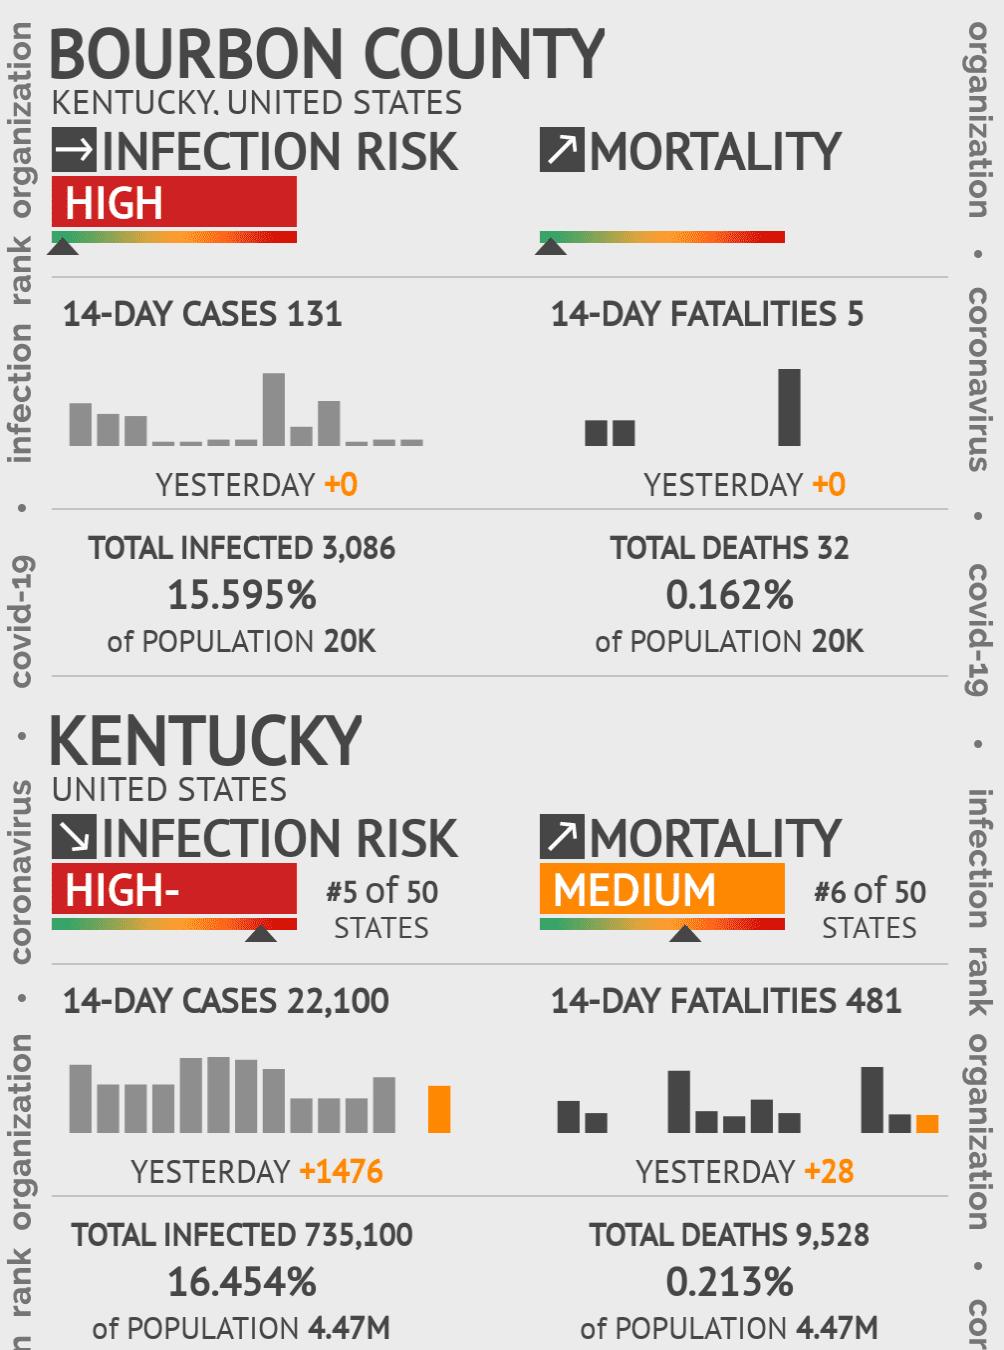 Bourbon County Coronavirus Covid-19 Risk of Infection on July 24, 2021